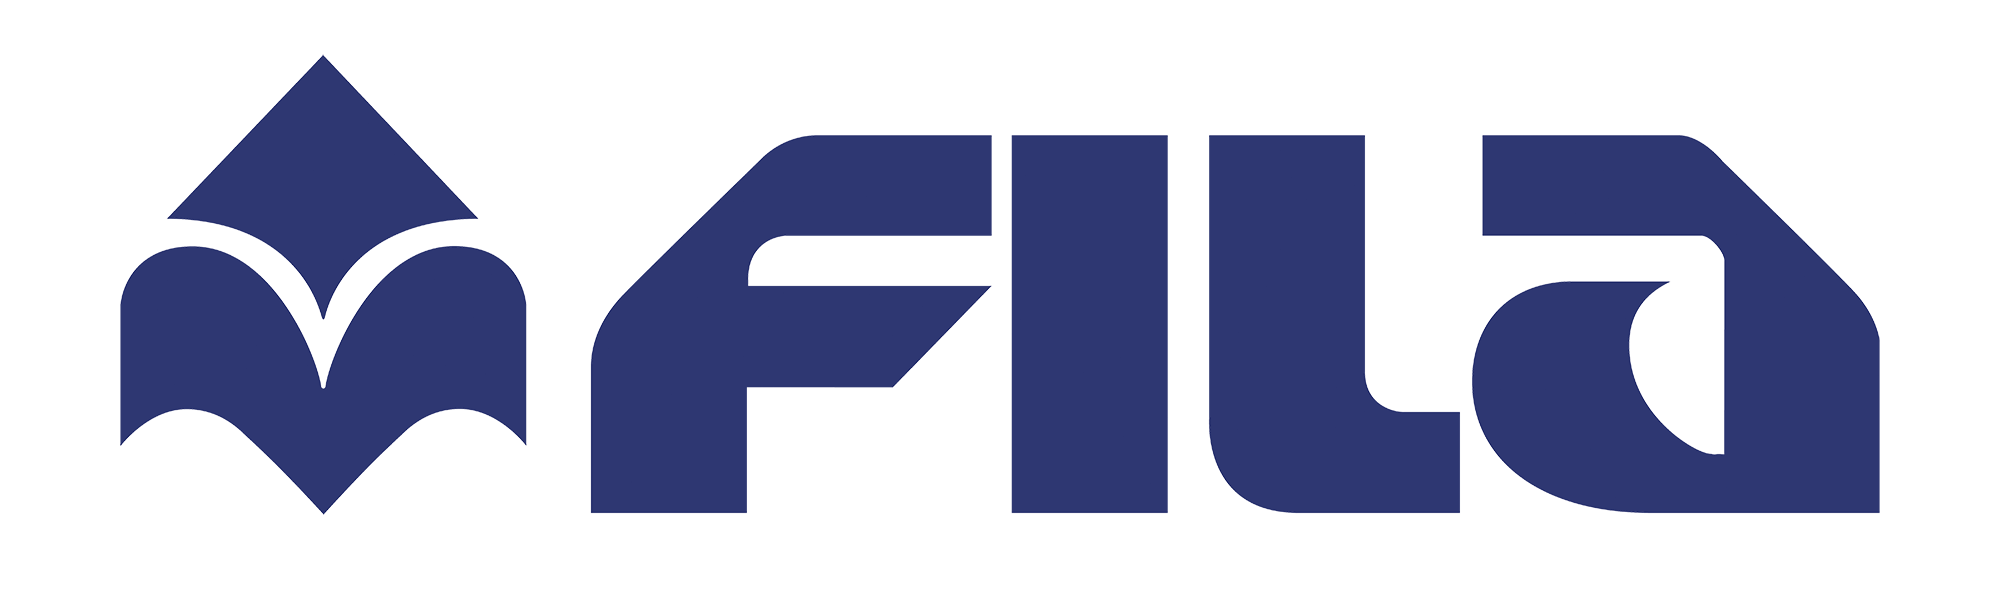 File:Logo FabbricaItalianaLapisAffini.png - Wikipedia